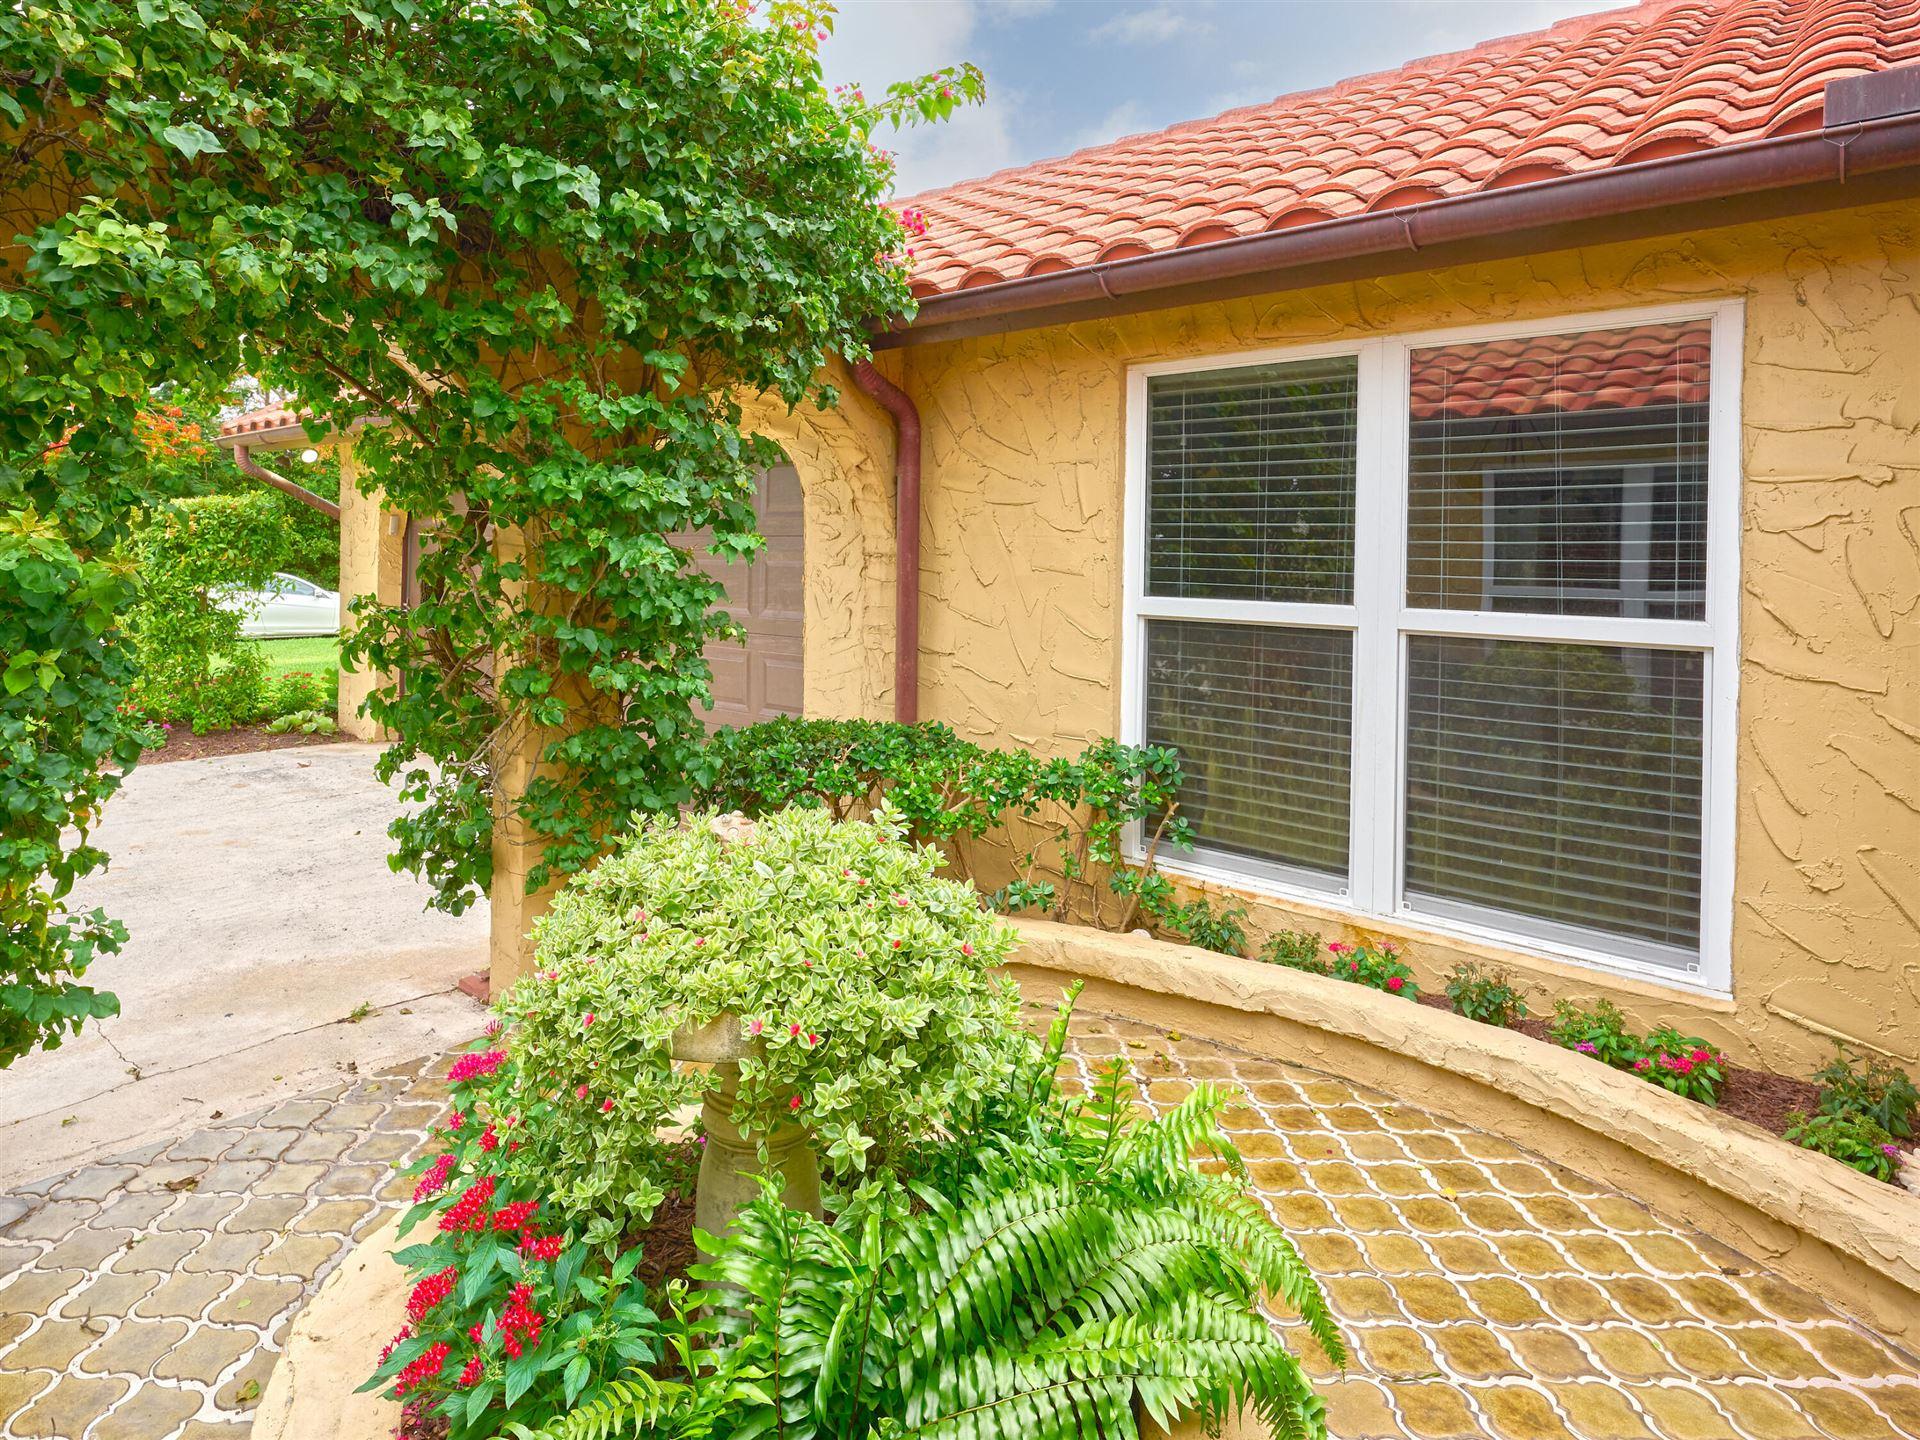 Photo of 451 Denny Court, Boca Raton, FL 33486 (MLS # RX-10725448)